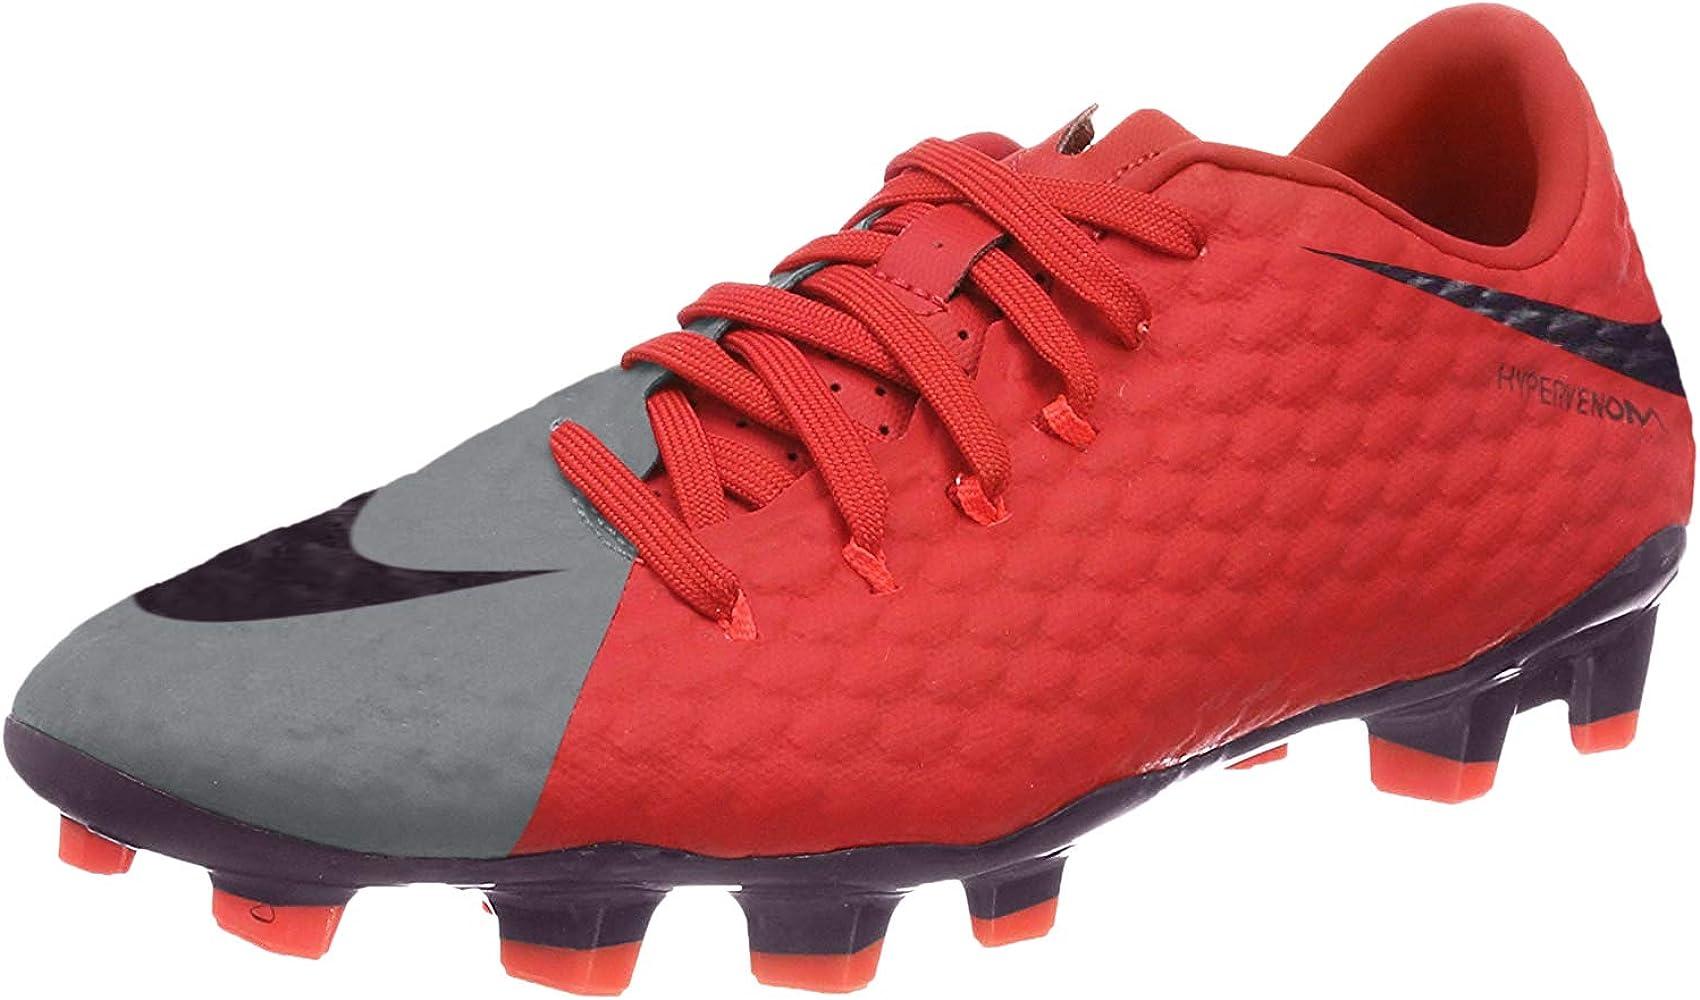 Hypervenom Phelon III FG Soccer Cleat